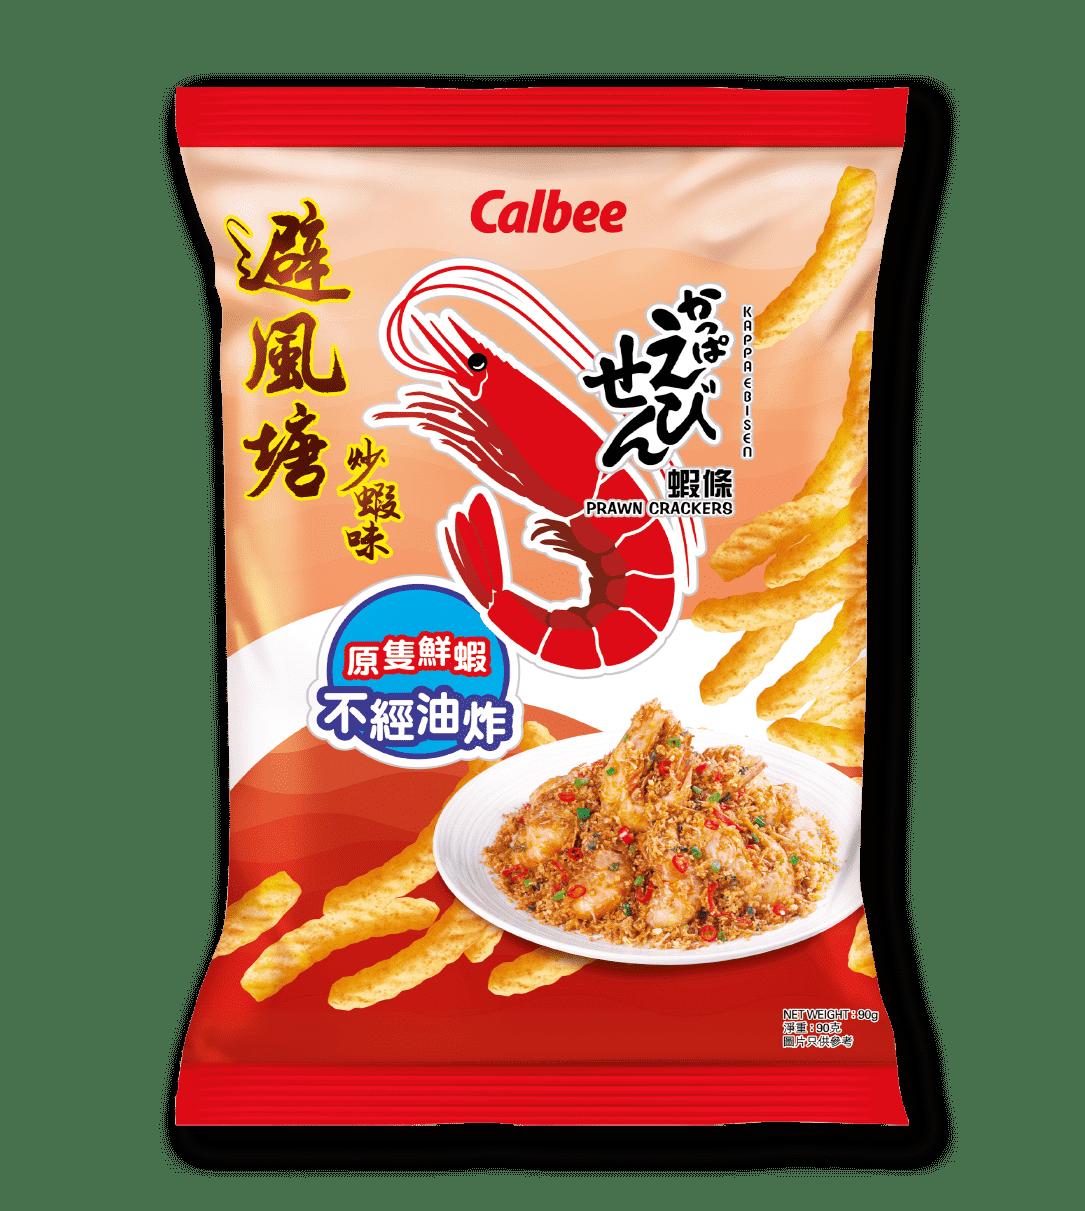 Calbee Australia - World Foods - Prawn Crackers - Typhoon Shelter